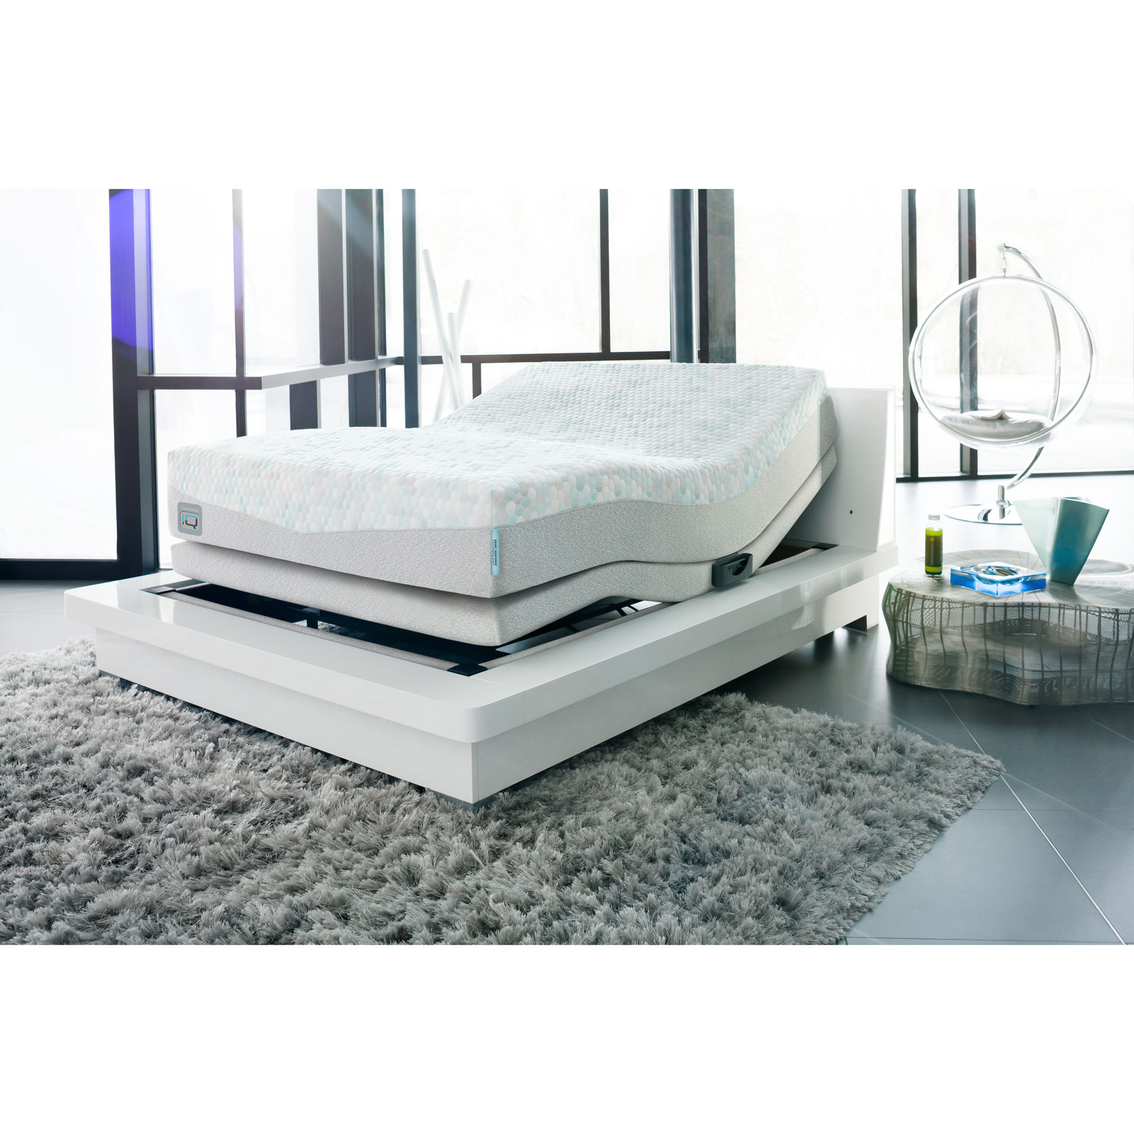 simmons comforpedic iq enlightened adjustable base luxury firm mattress set mattresses home. Black Bedroom Furniture Sets. Home Design Ideas